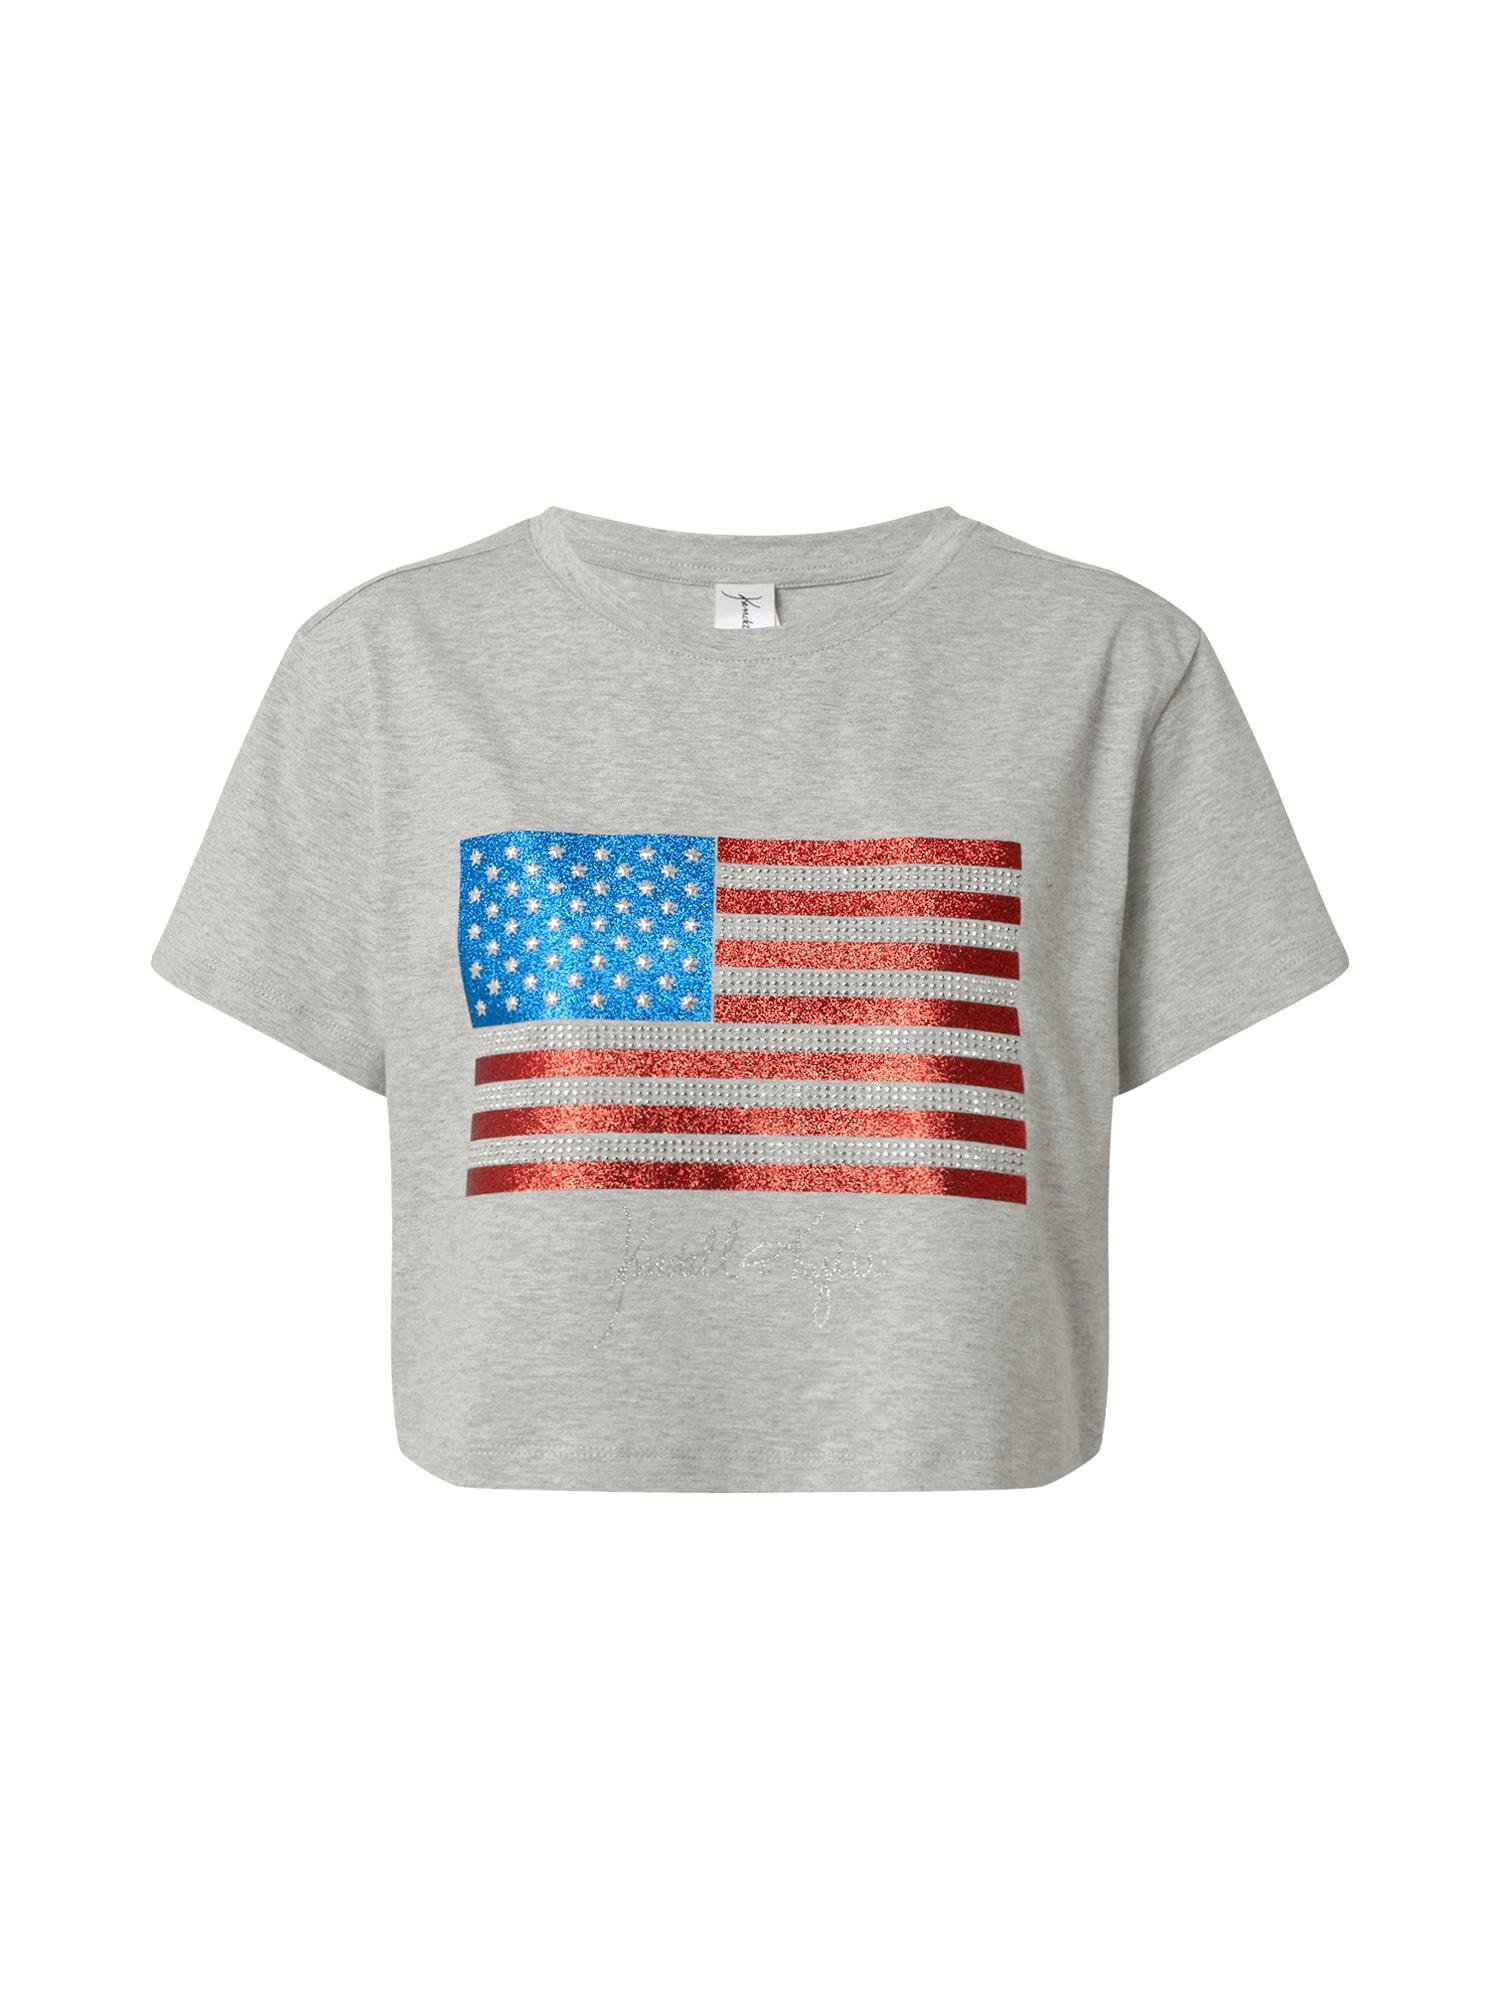 KENDALL + KYLIE Marškinėliai margai pilka / mėlyna / raudona